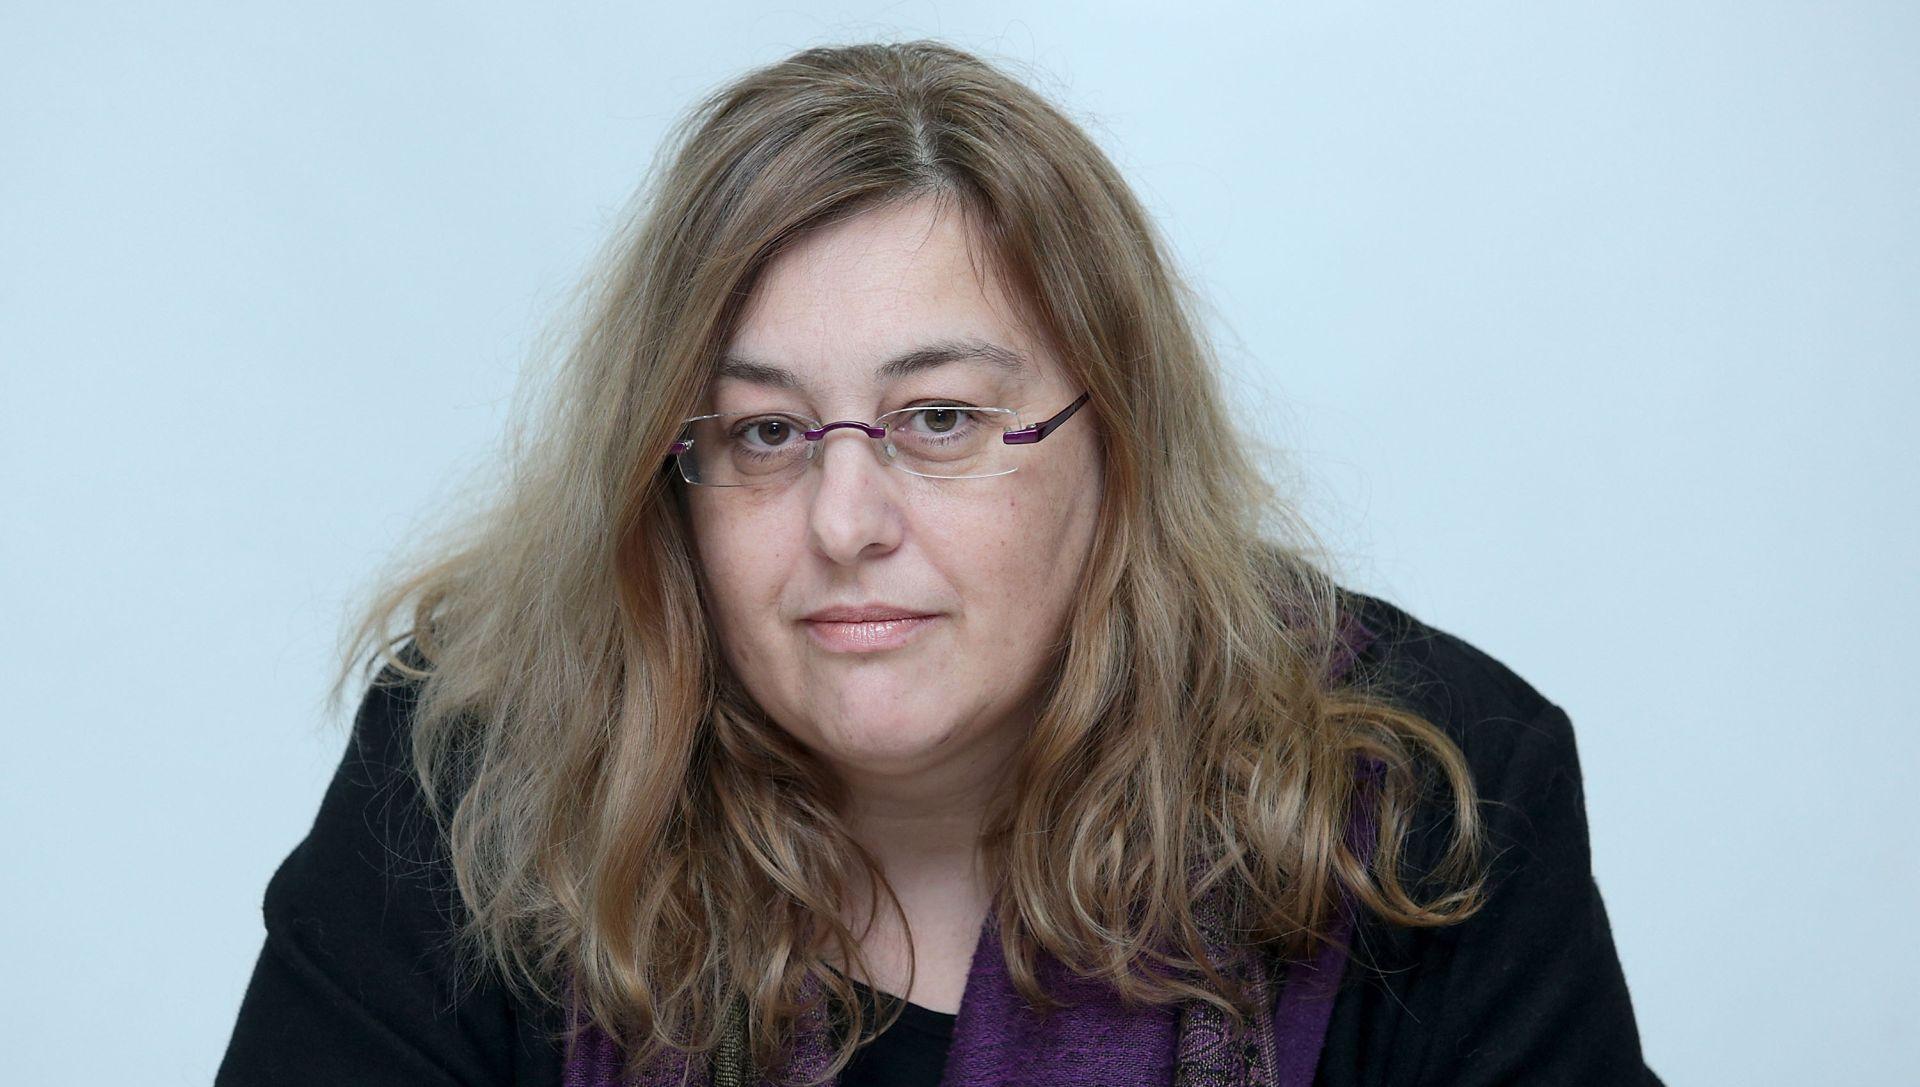 Ženska mreža: DORH unosi pomutnju, položaj žena u politici nikad gori